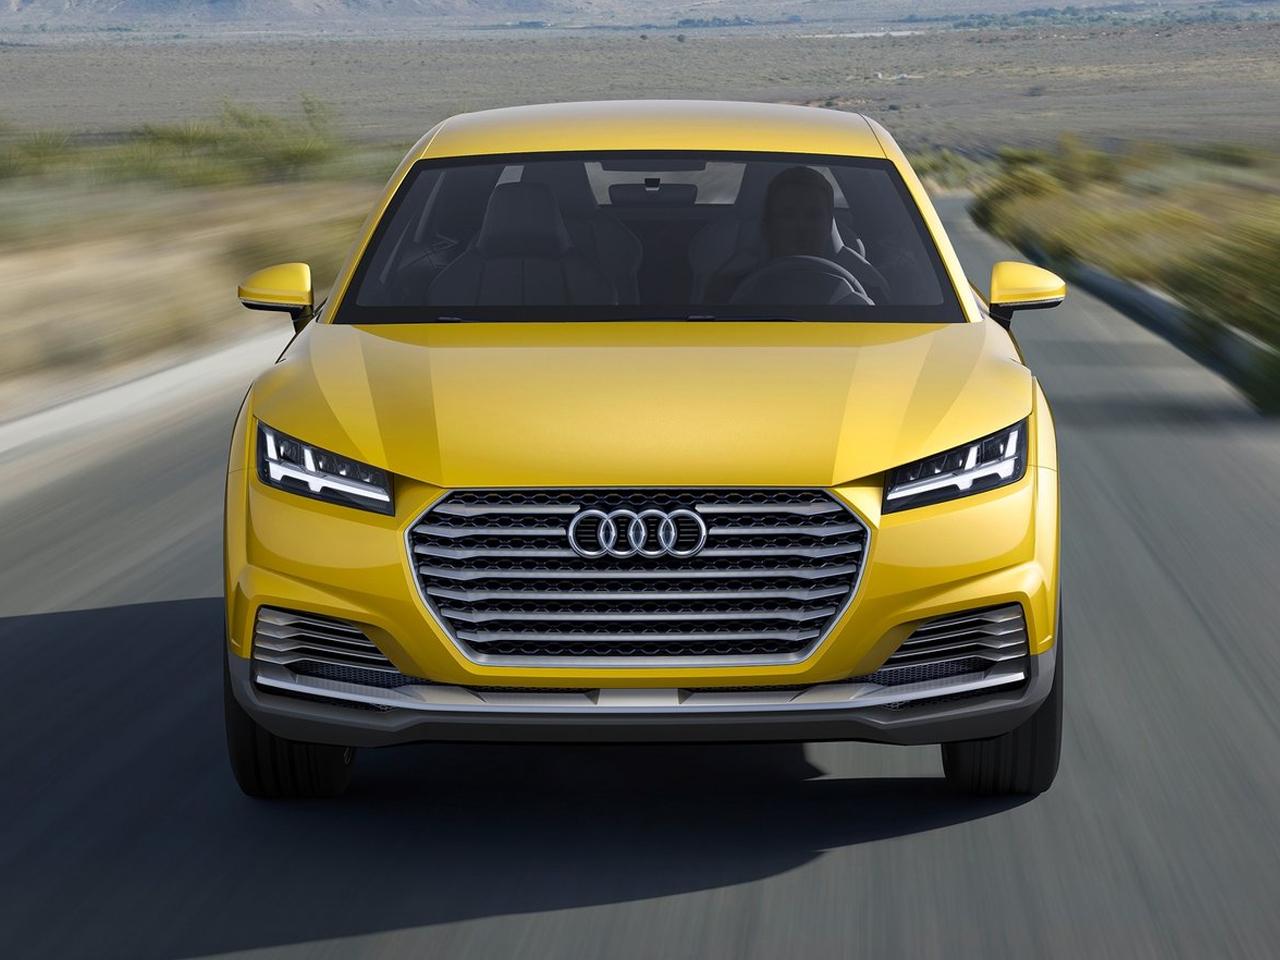 Audi Q4 frontal